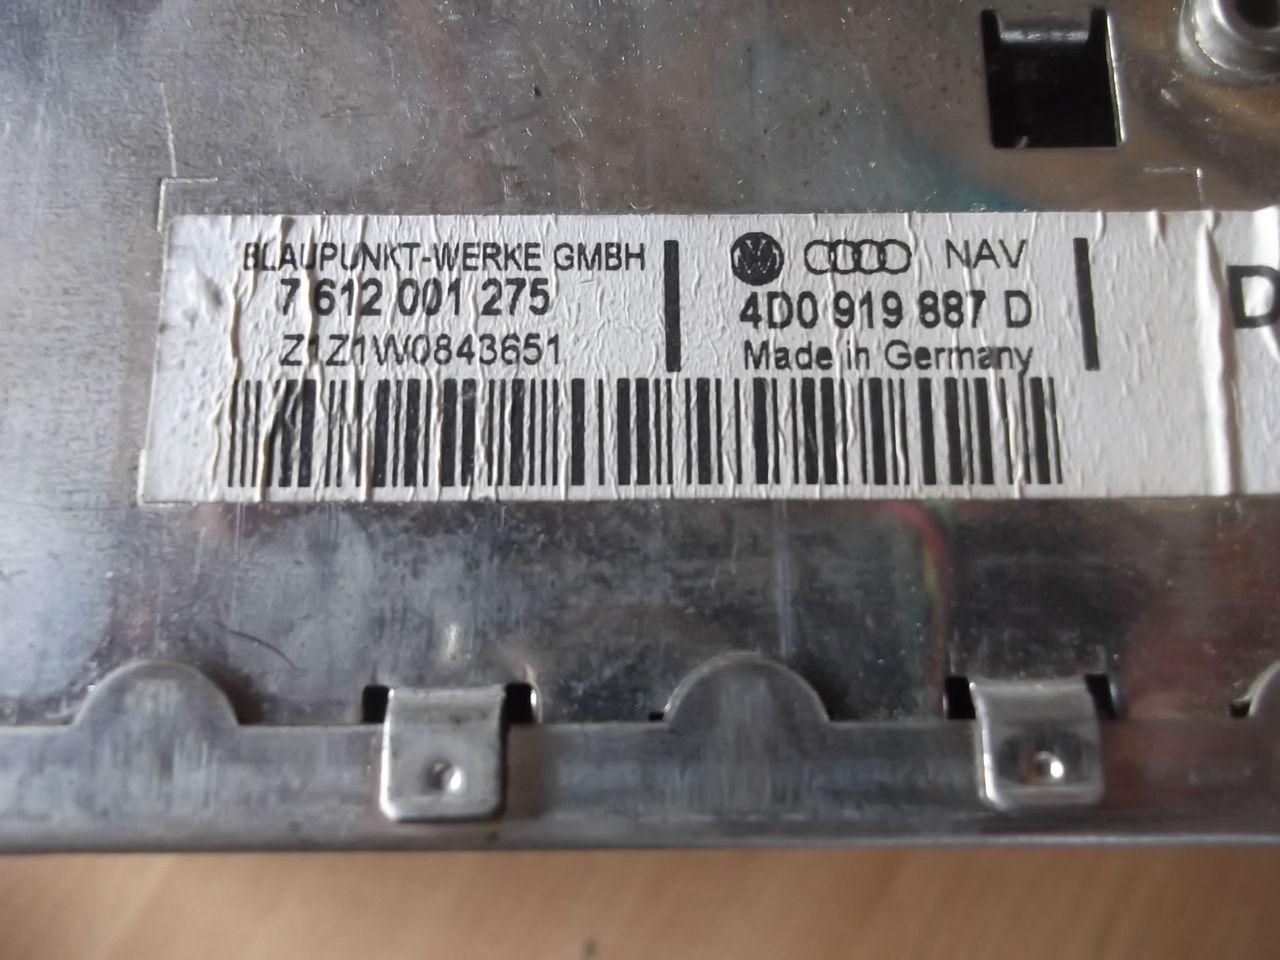 sistem navigatie audi a4  cod 4DO919887D  sau 7612001275